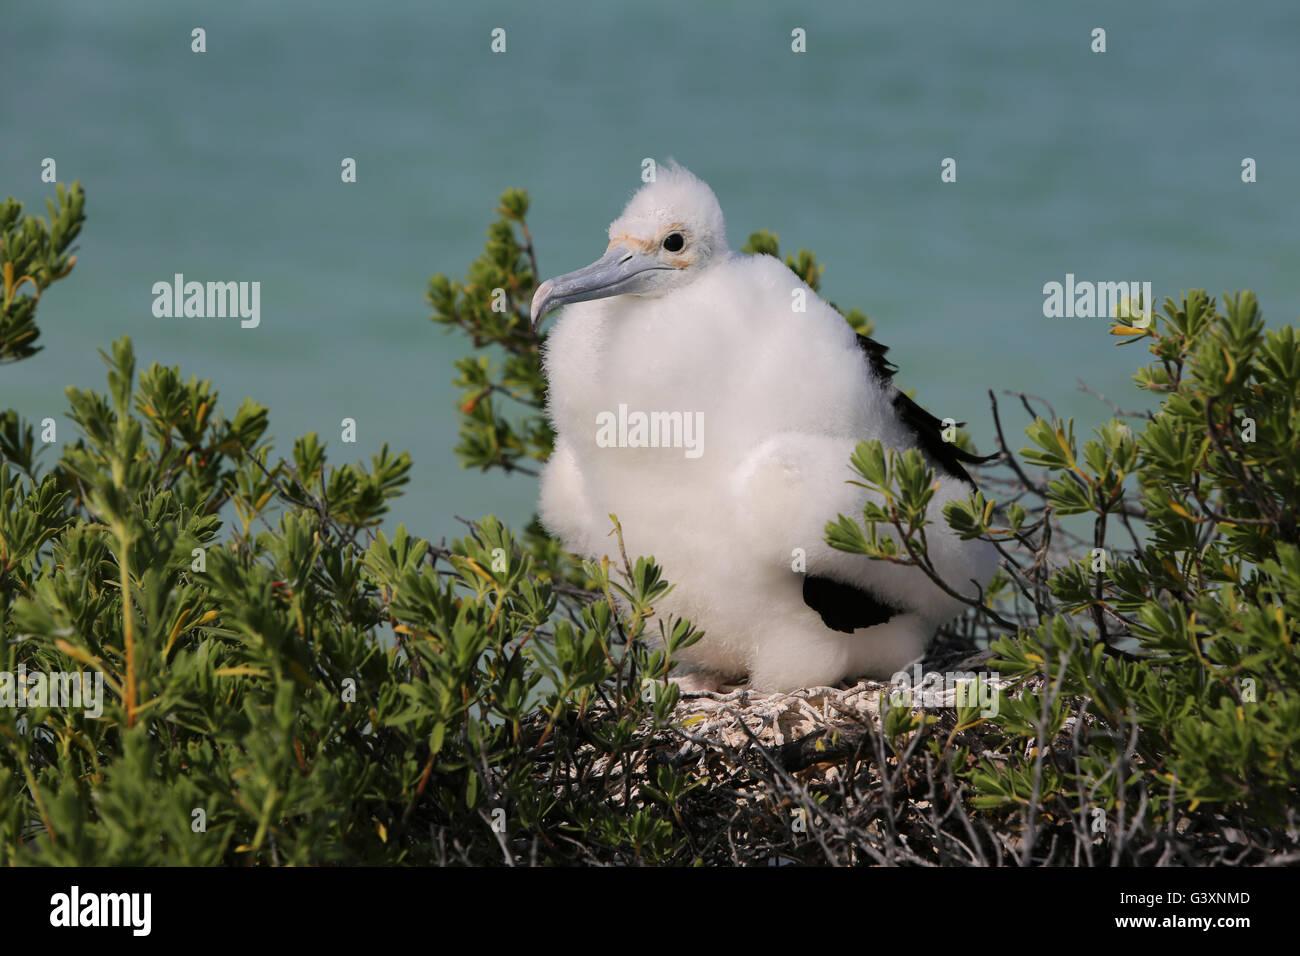 Frigatebird chick in the nest, Christmas Island, Kiribati - Stock Image